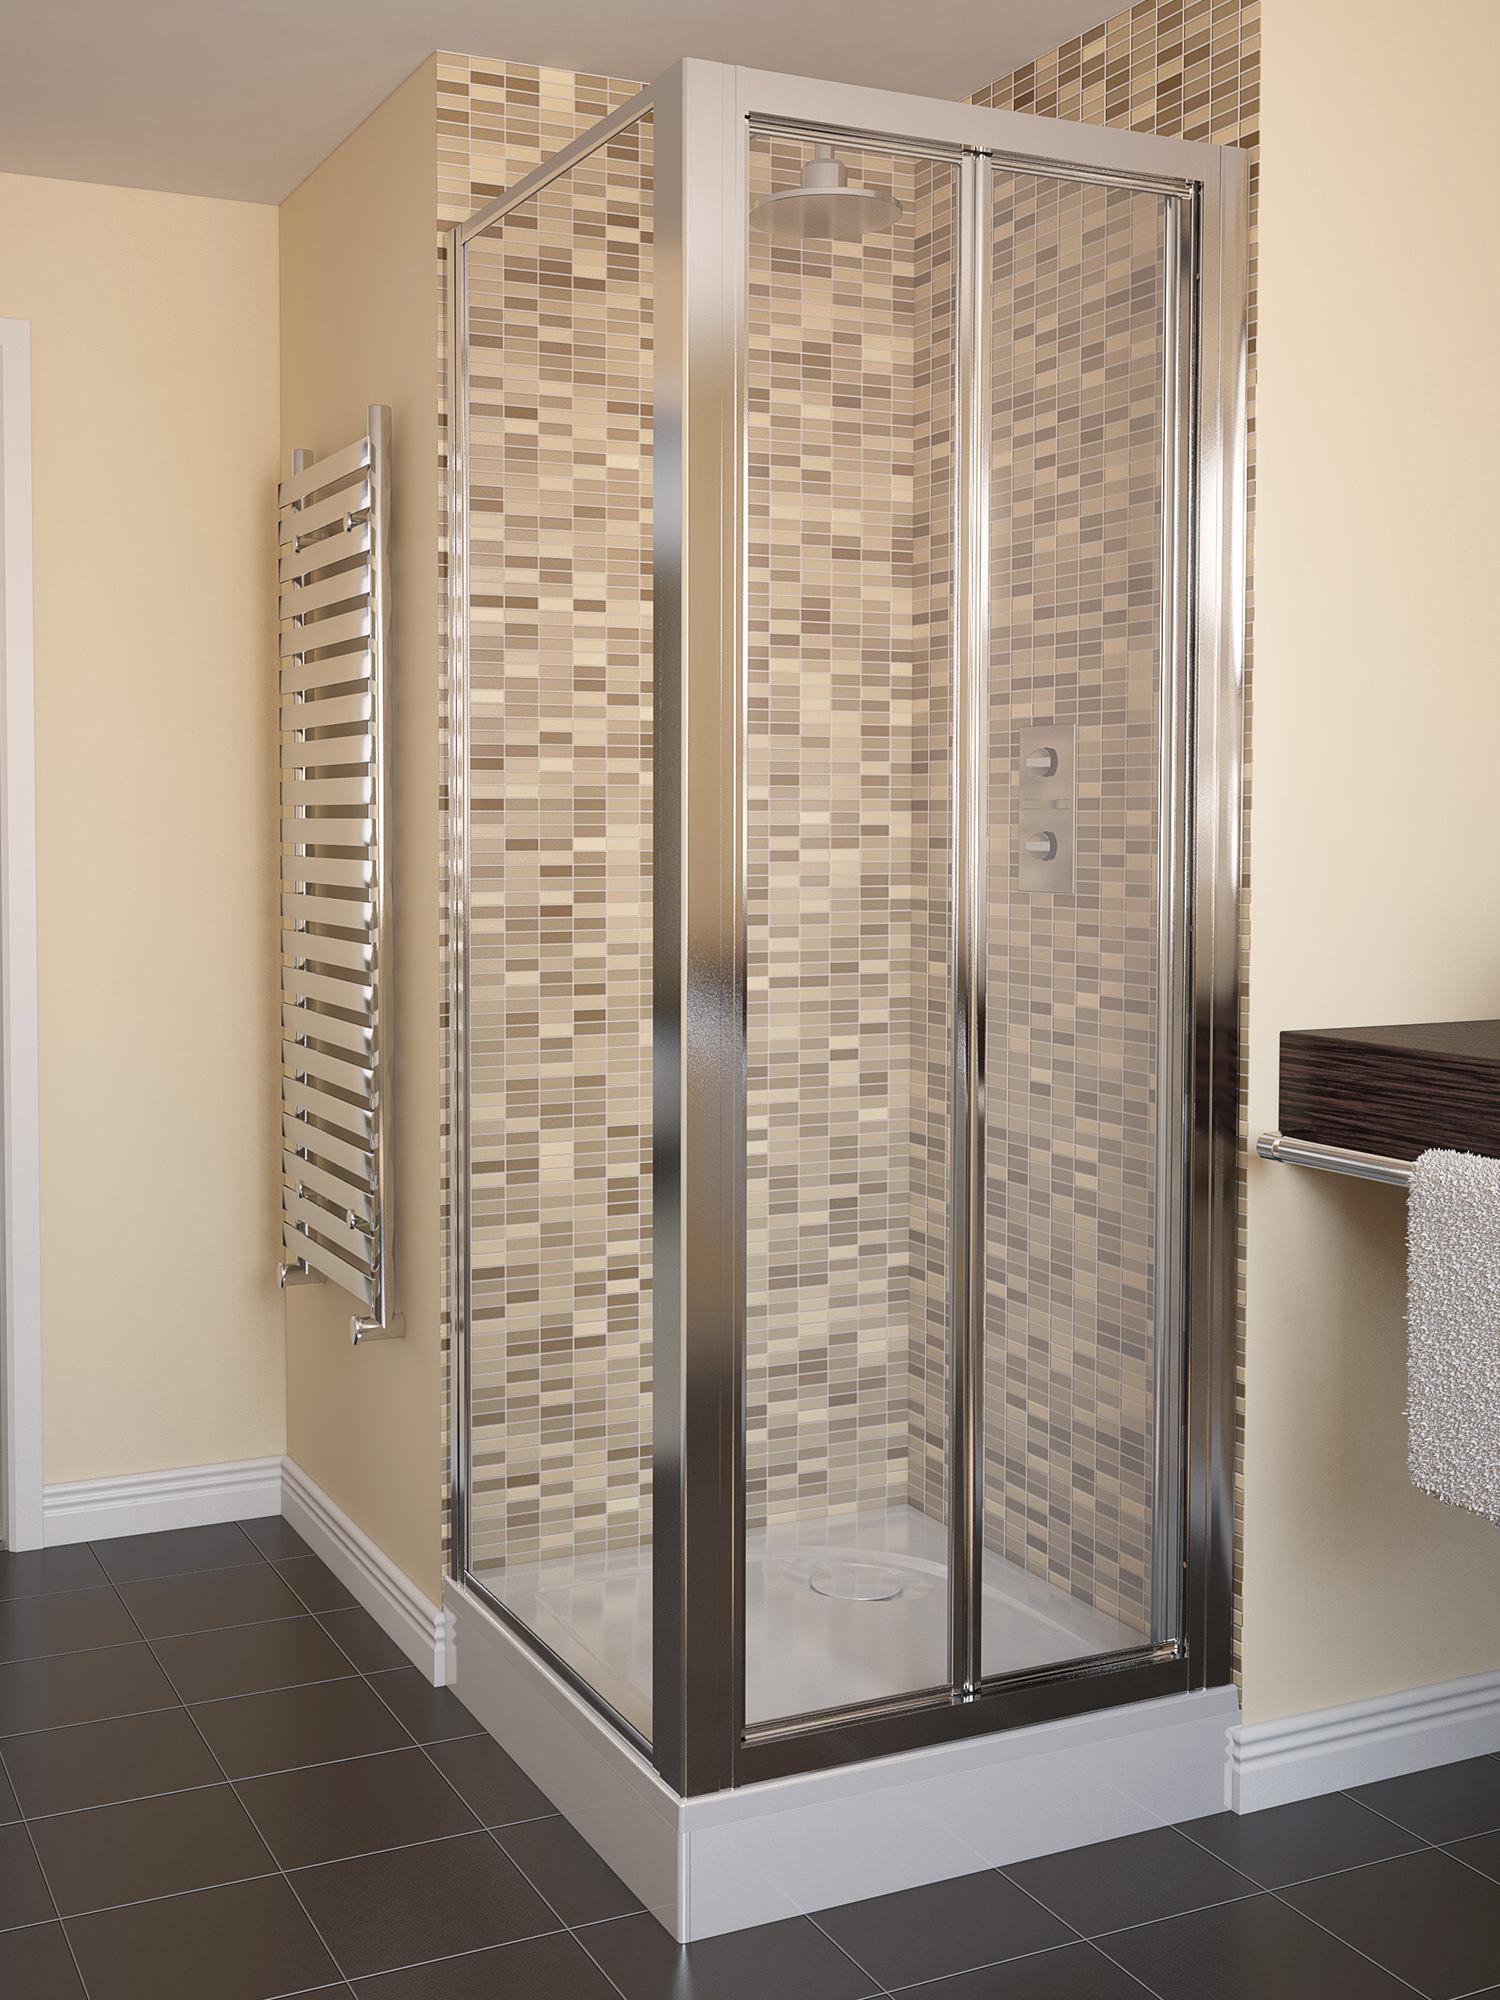 Aqualux Aqua 4 760mm Bi Fold Shower Door Polished Silver